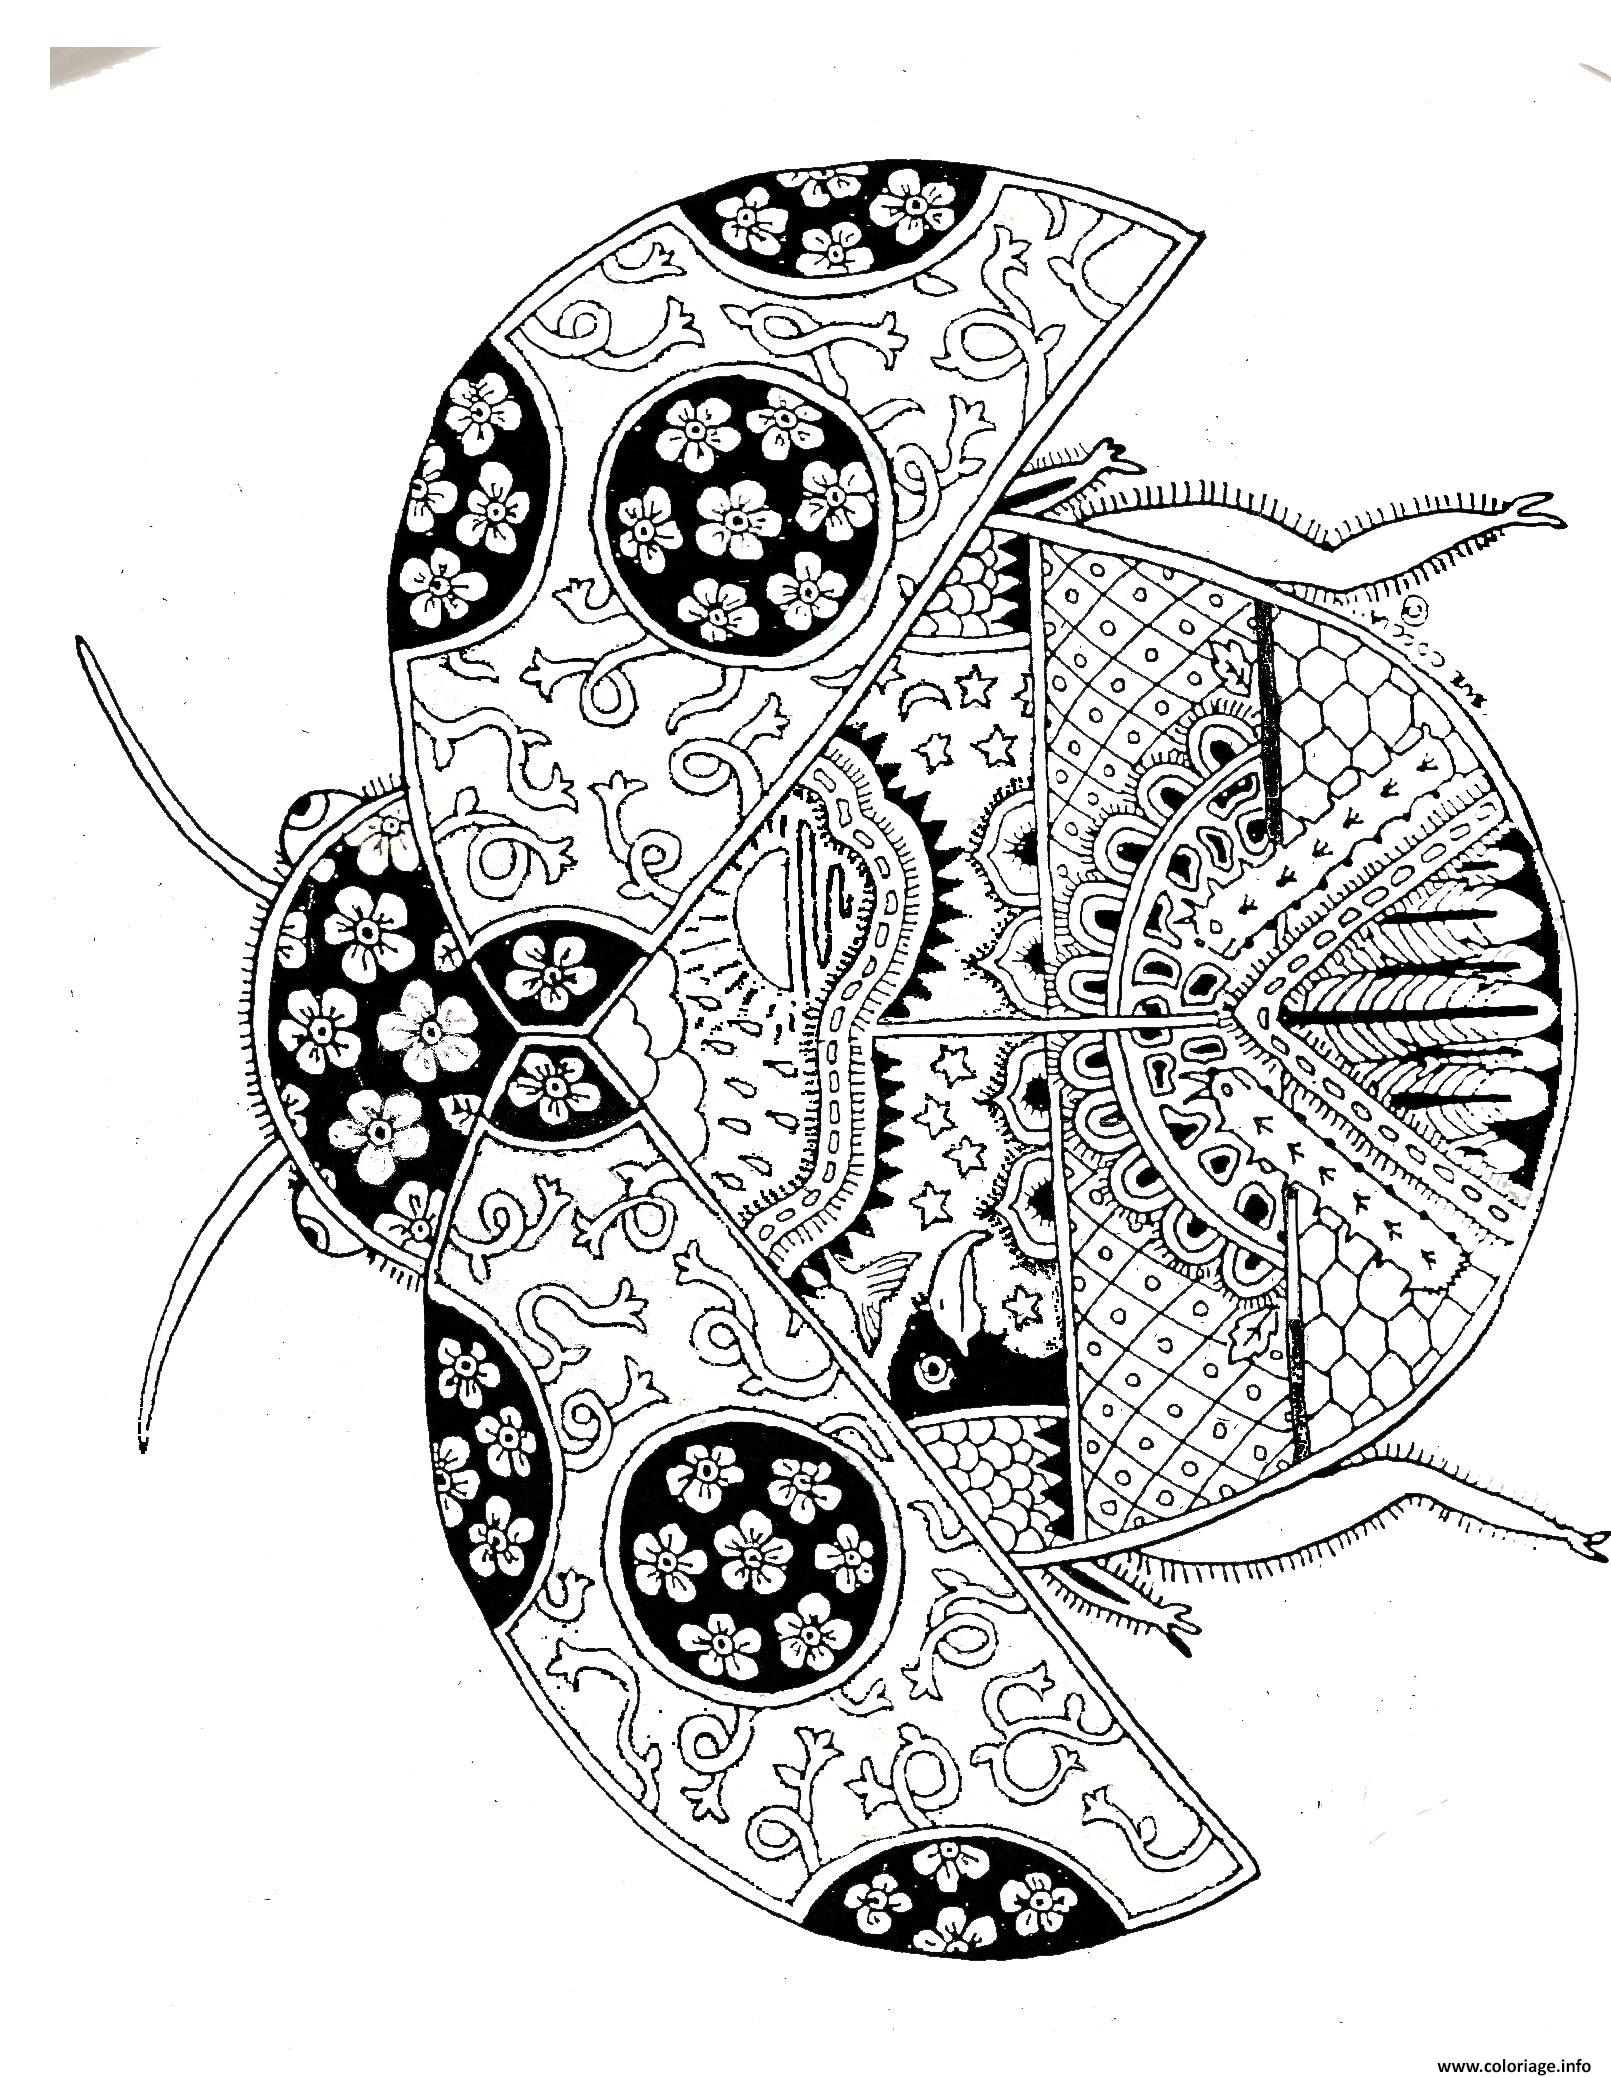 Meilleur De Dessin Coloriage Ladybug